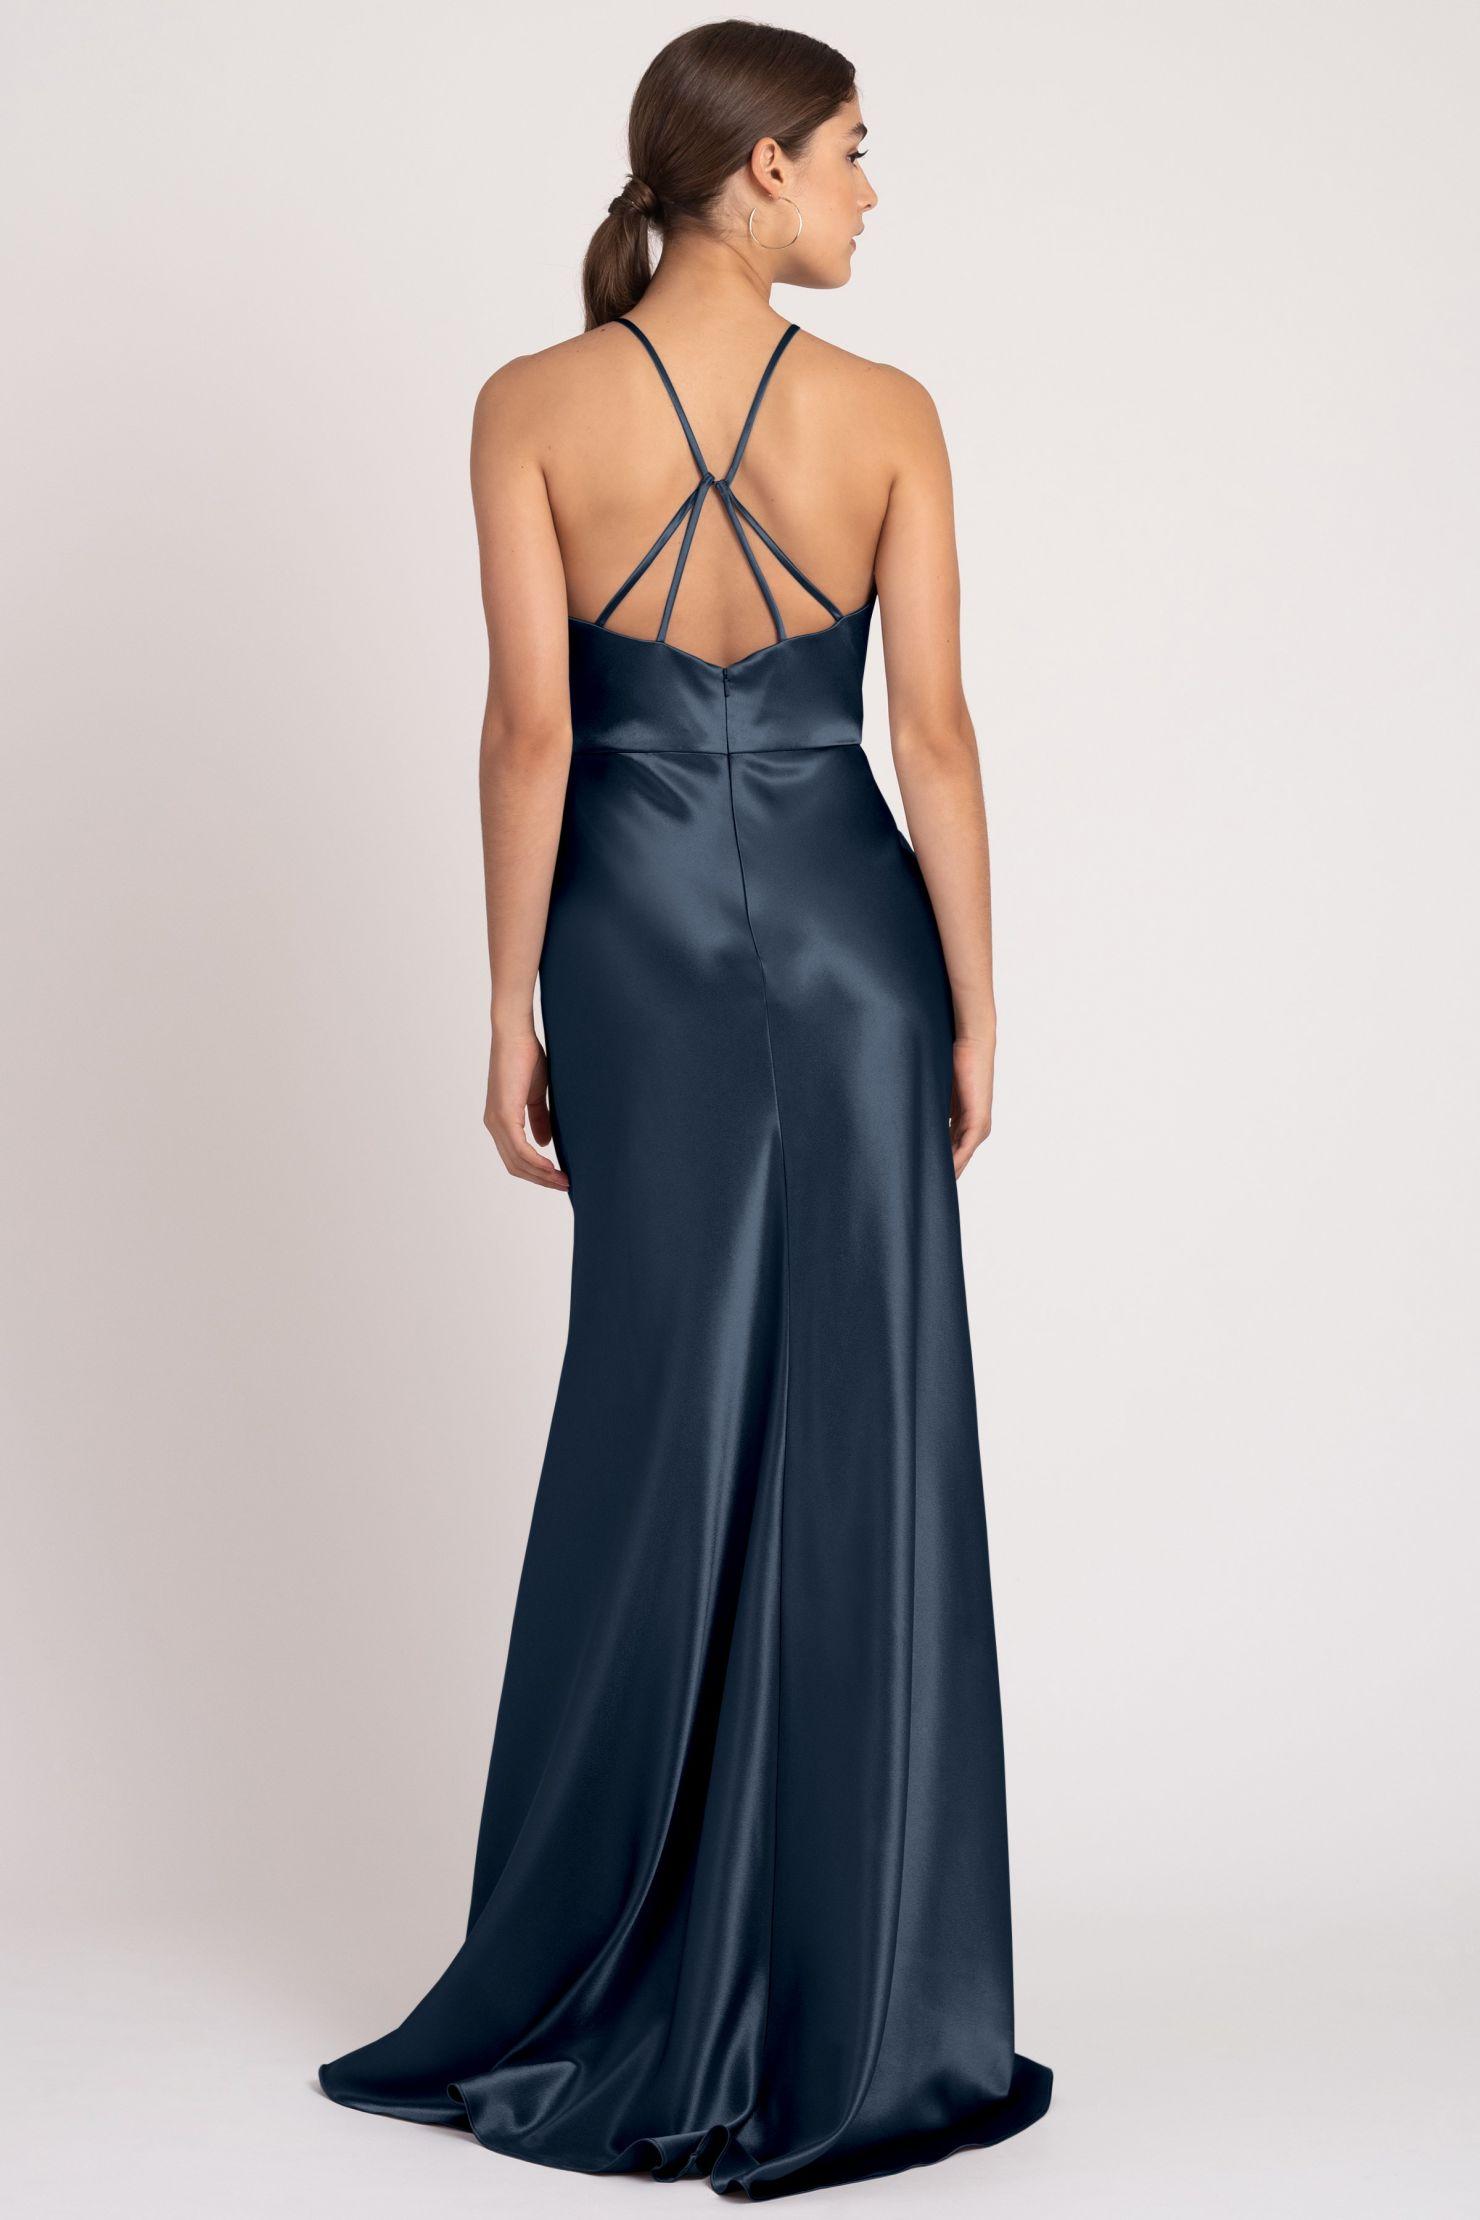 Alessia Bridesmaids Dress by Jenny Yoo - French Blue